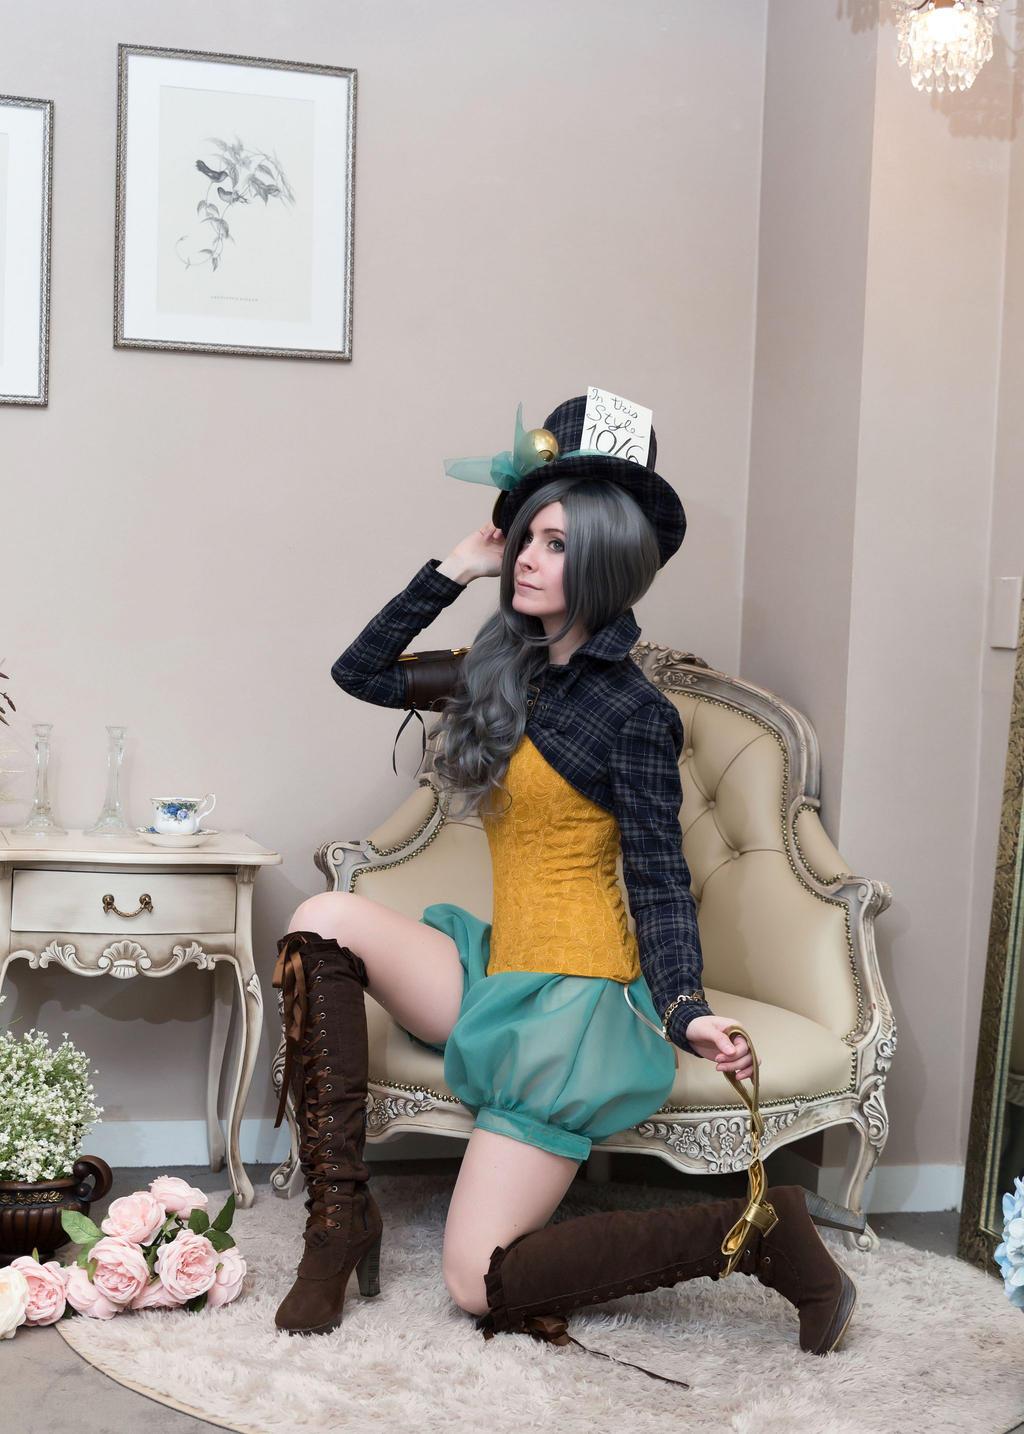 Alice Collection - Mad Hatter (Original Design) by busanpanda